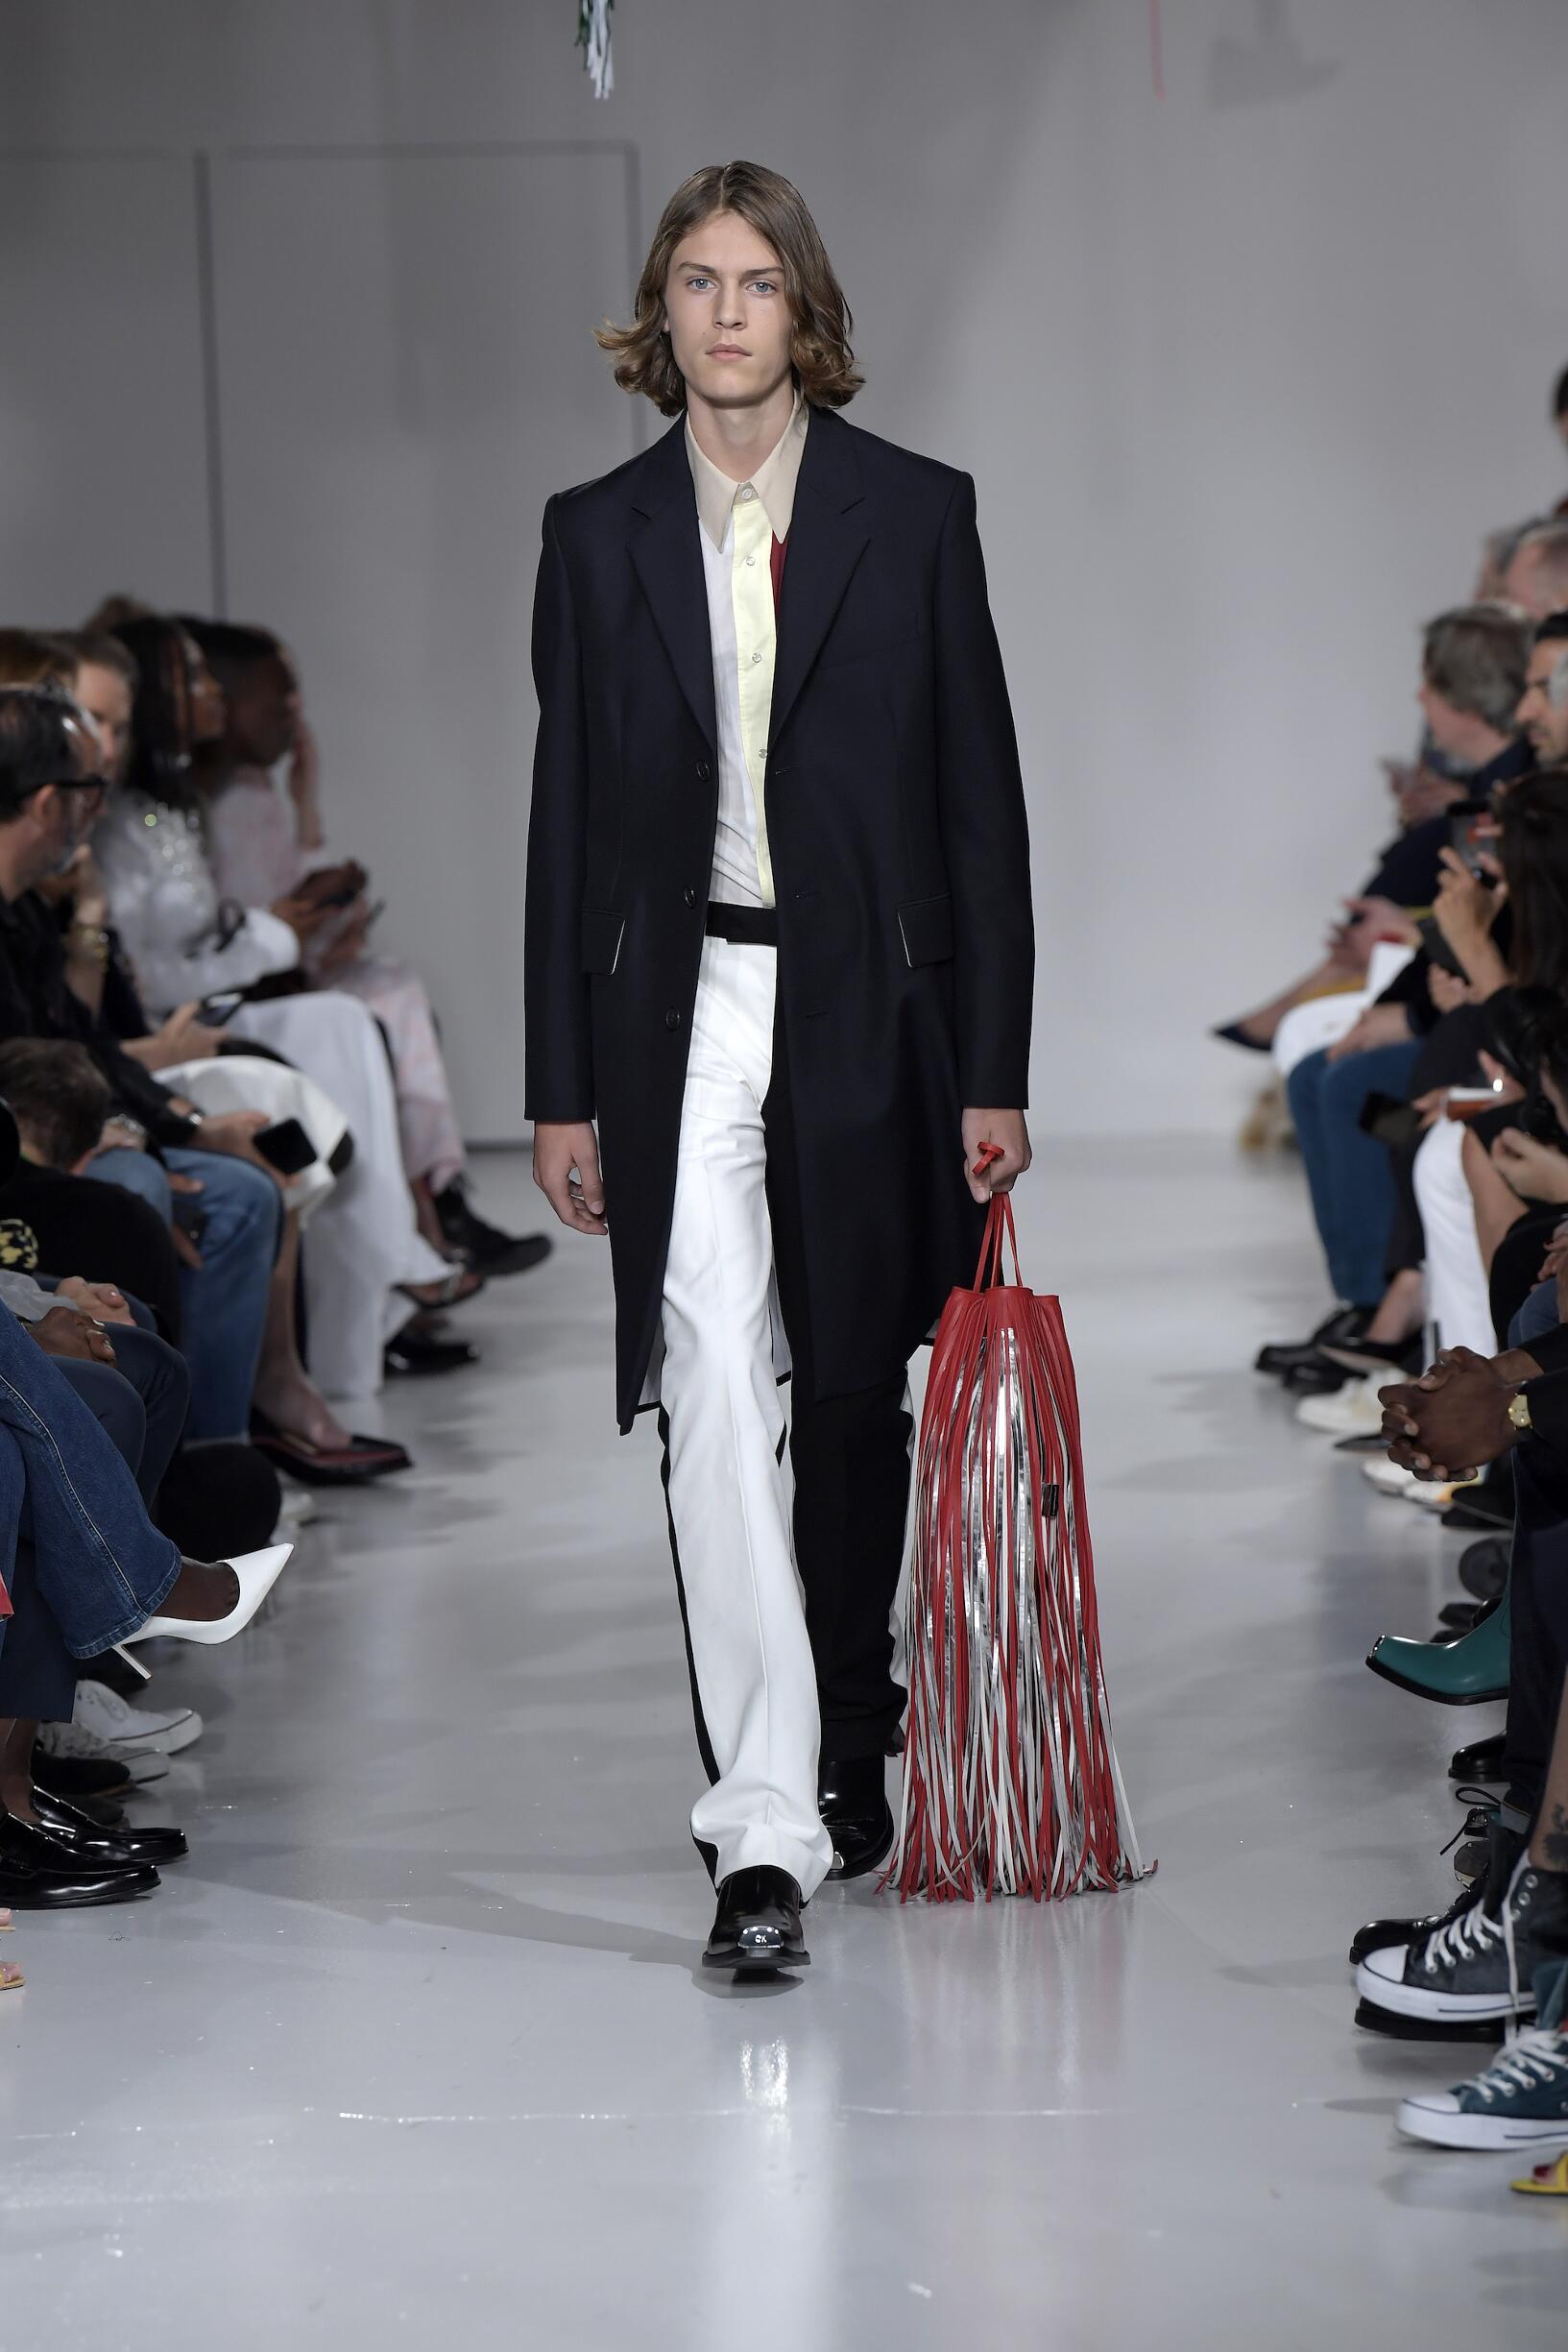 SS 2018 Calvin Klein 205W39NYC Fashion Show New York Fashion Week